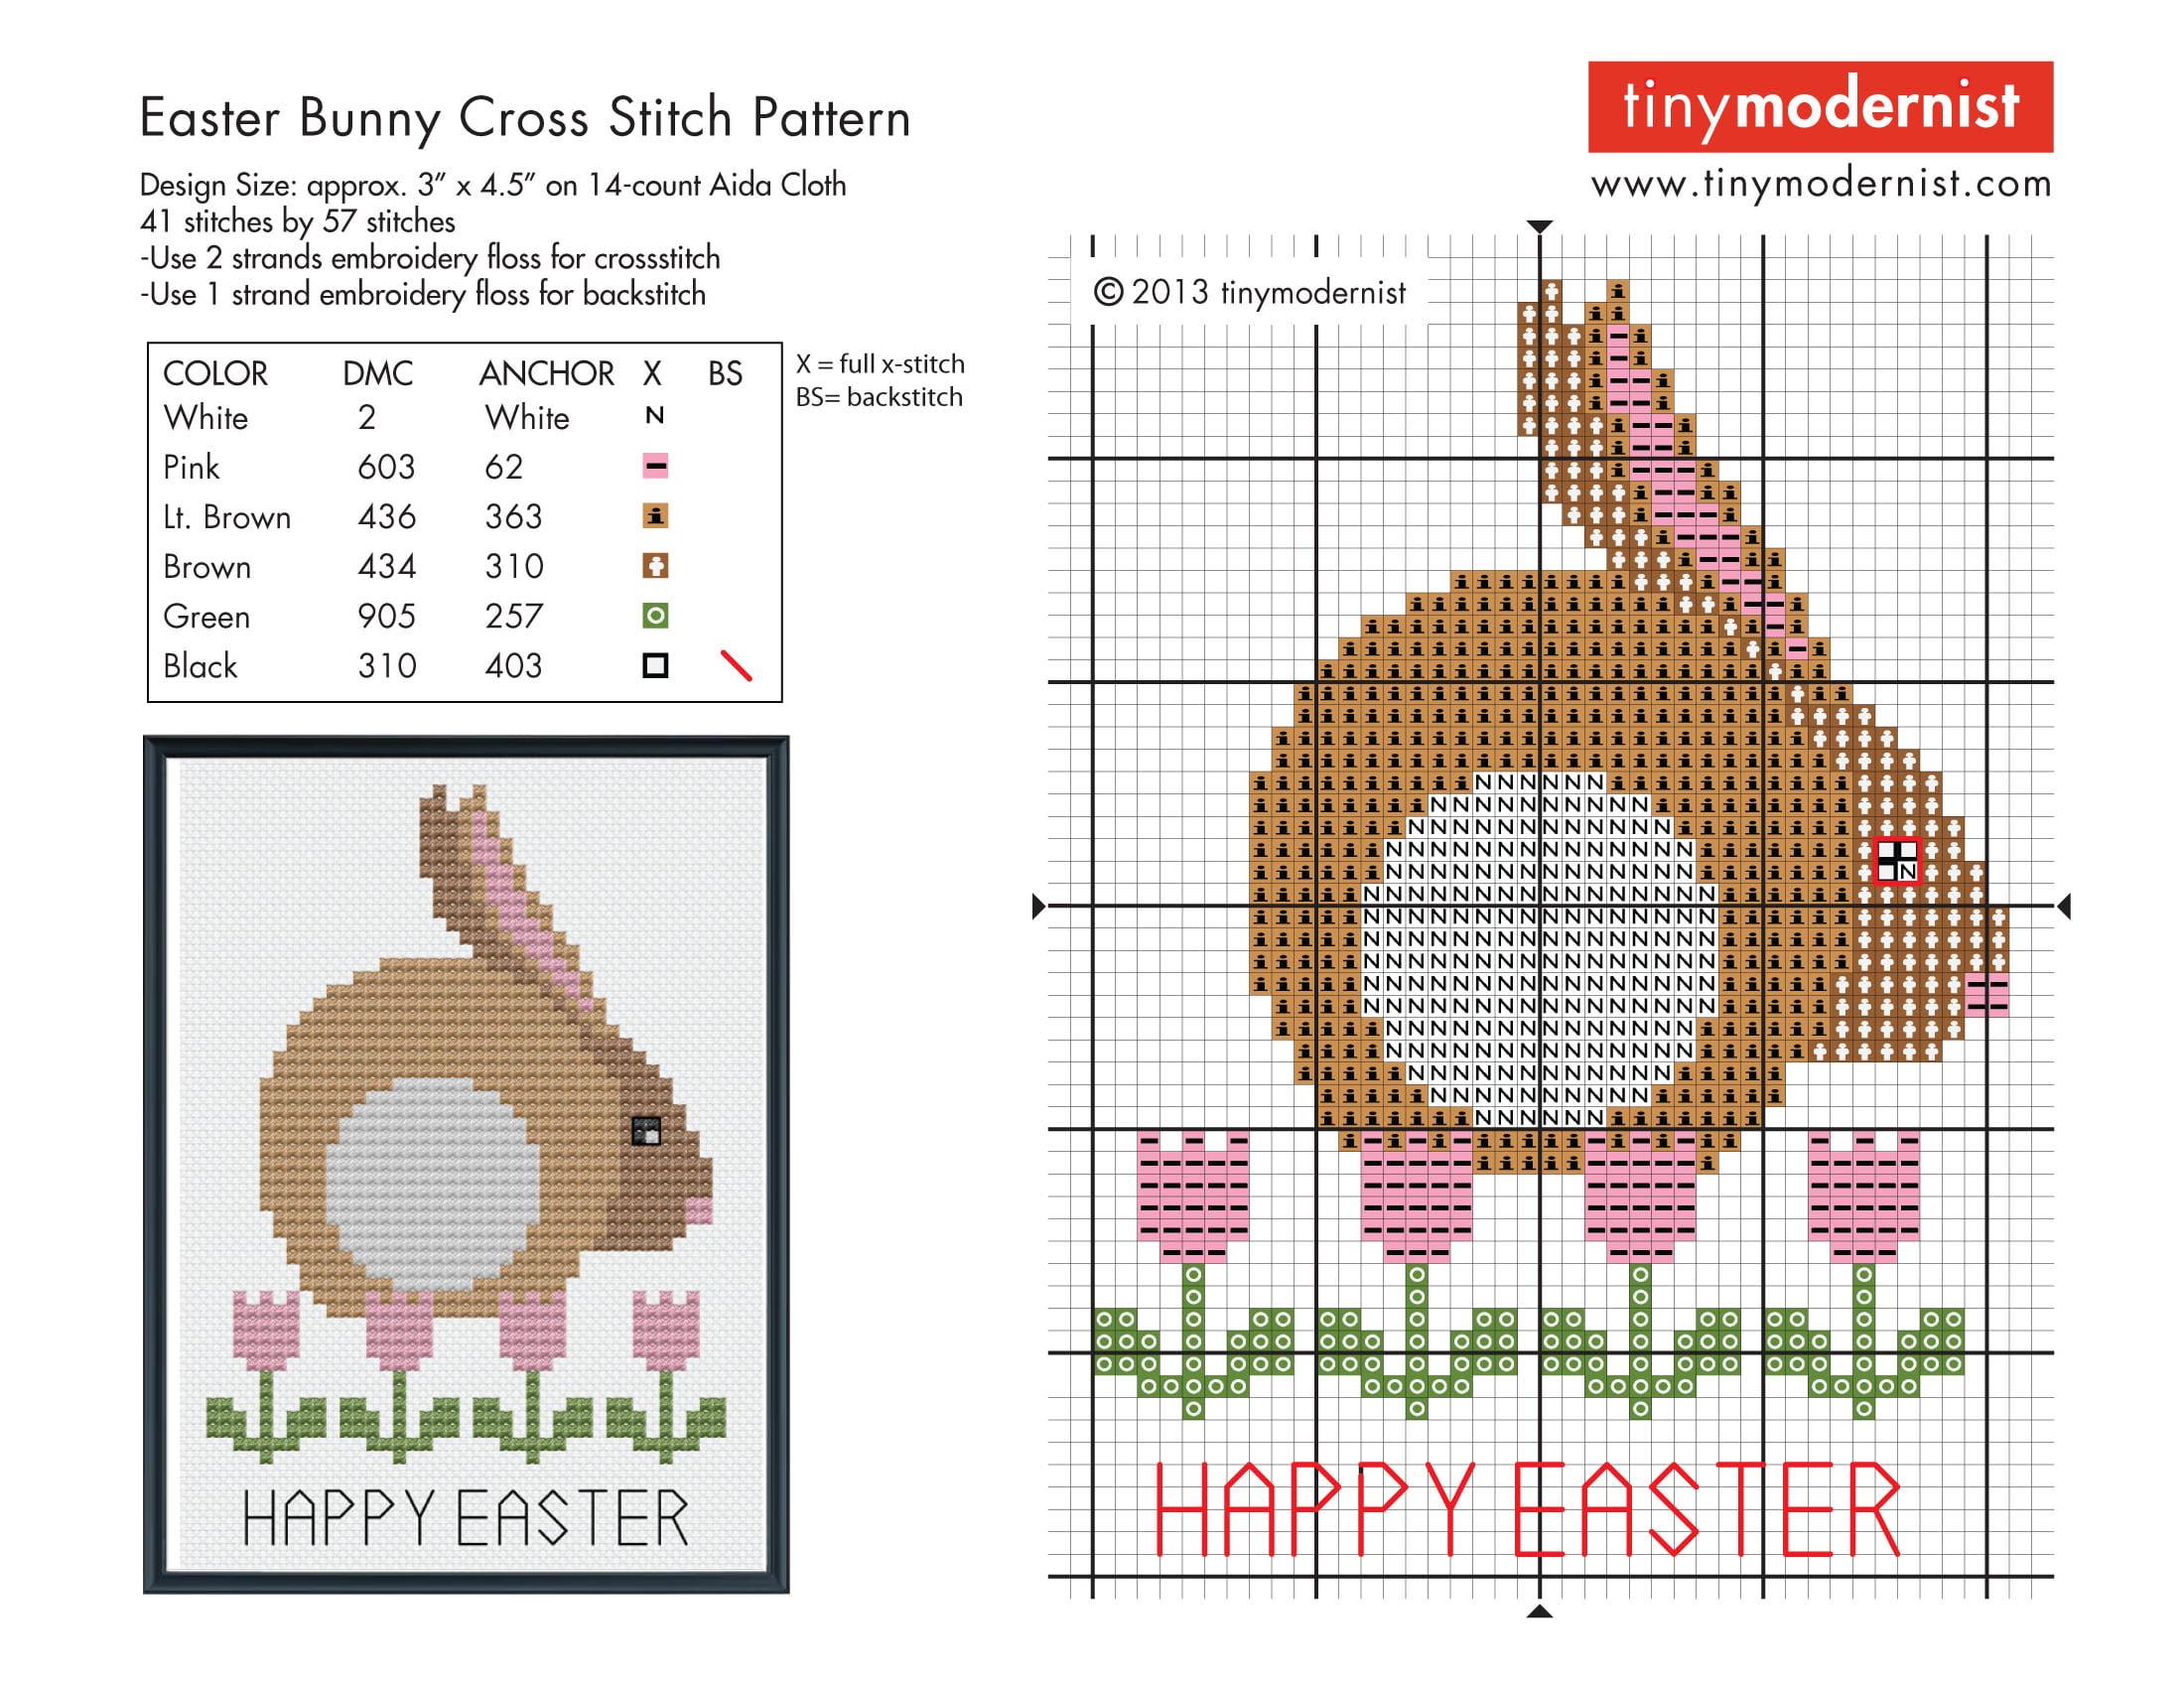 free cross stitch patterns to download online